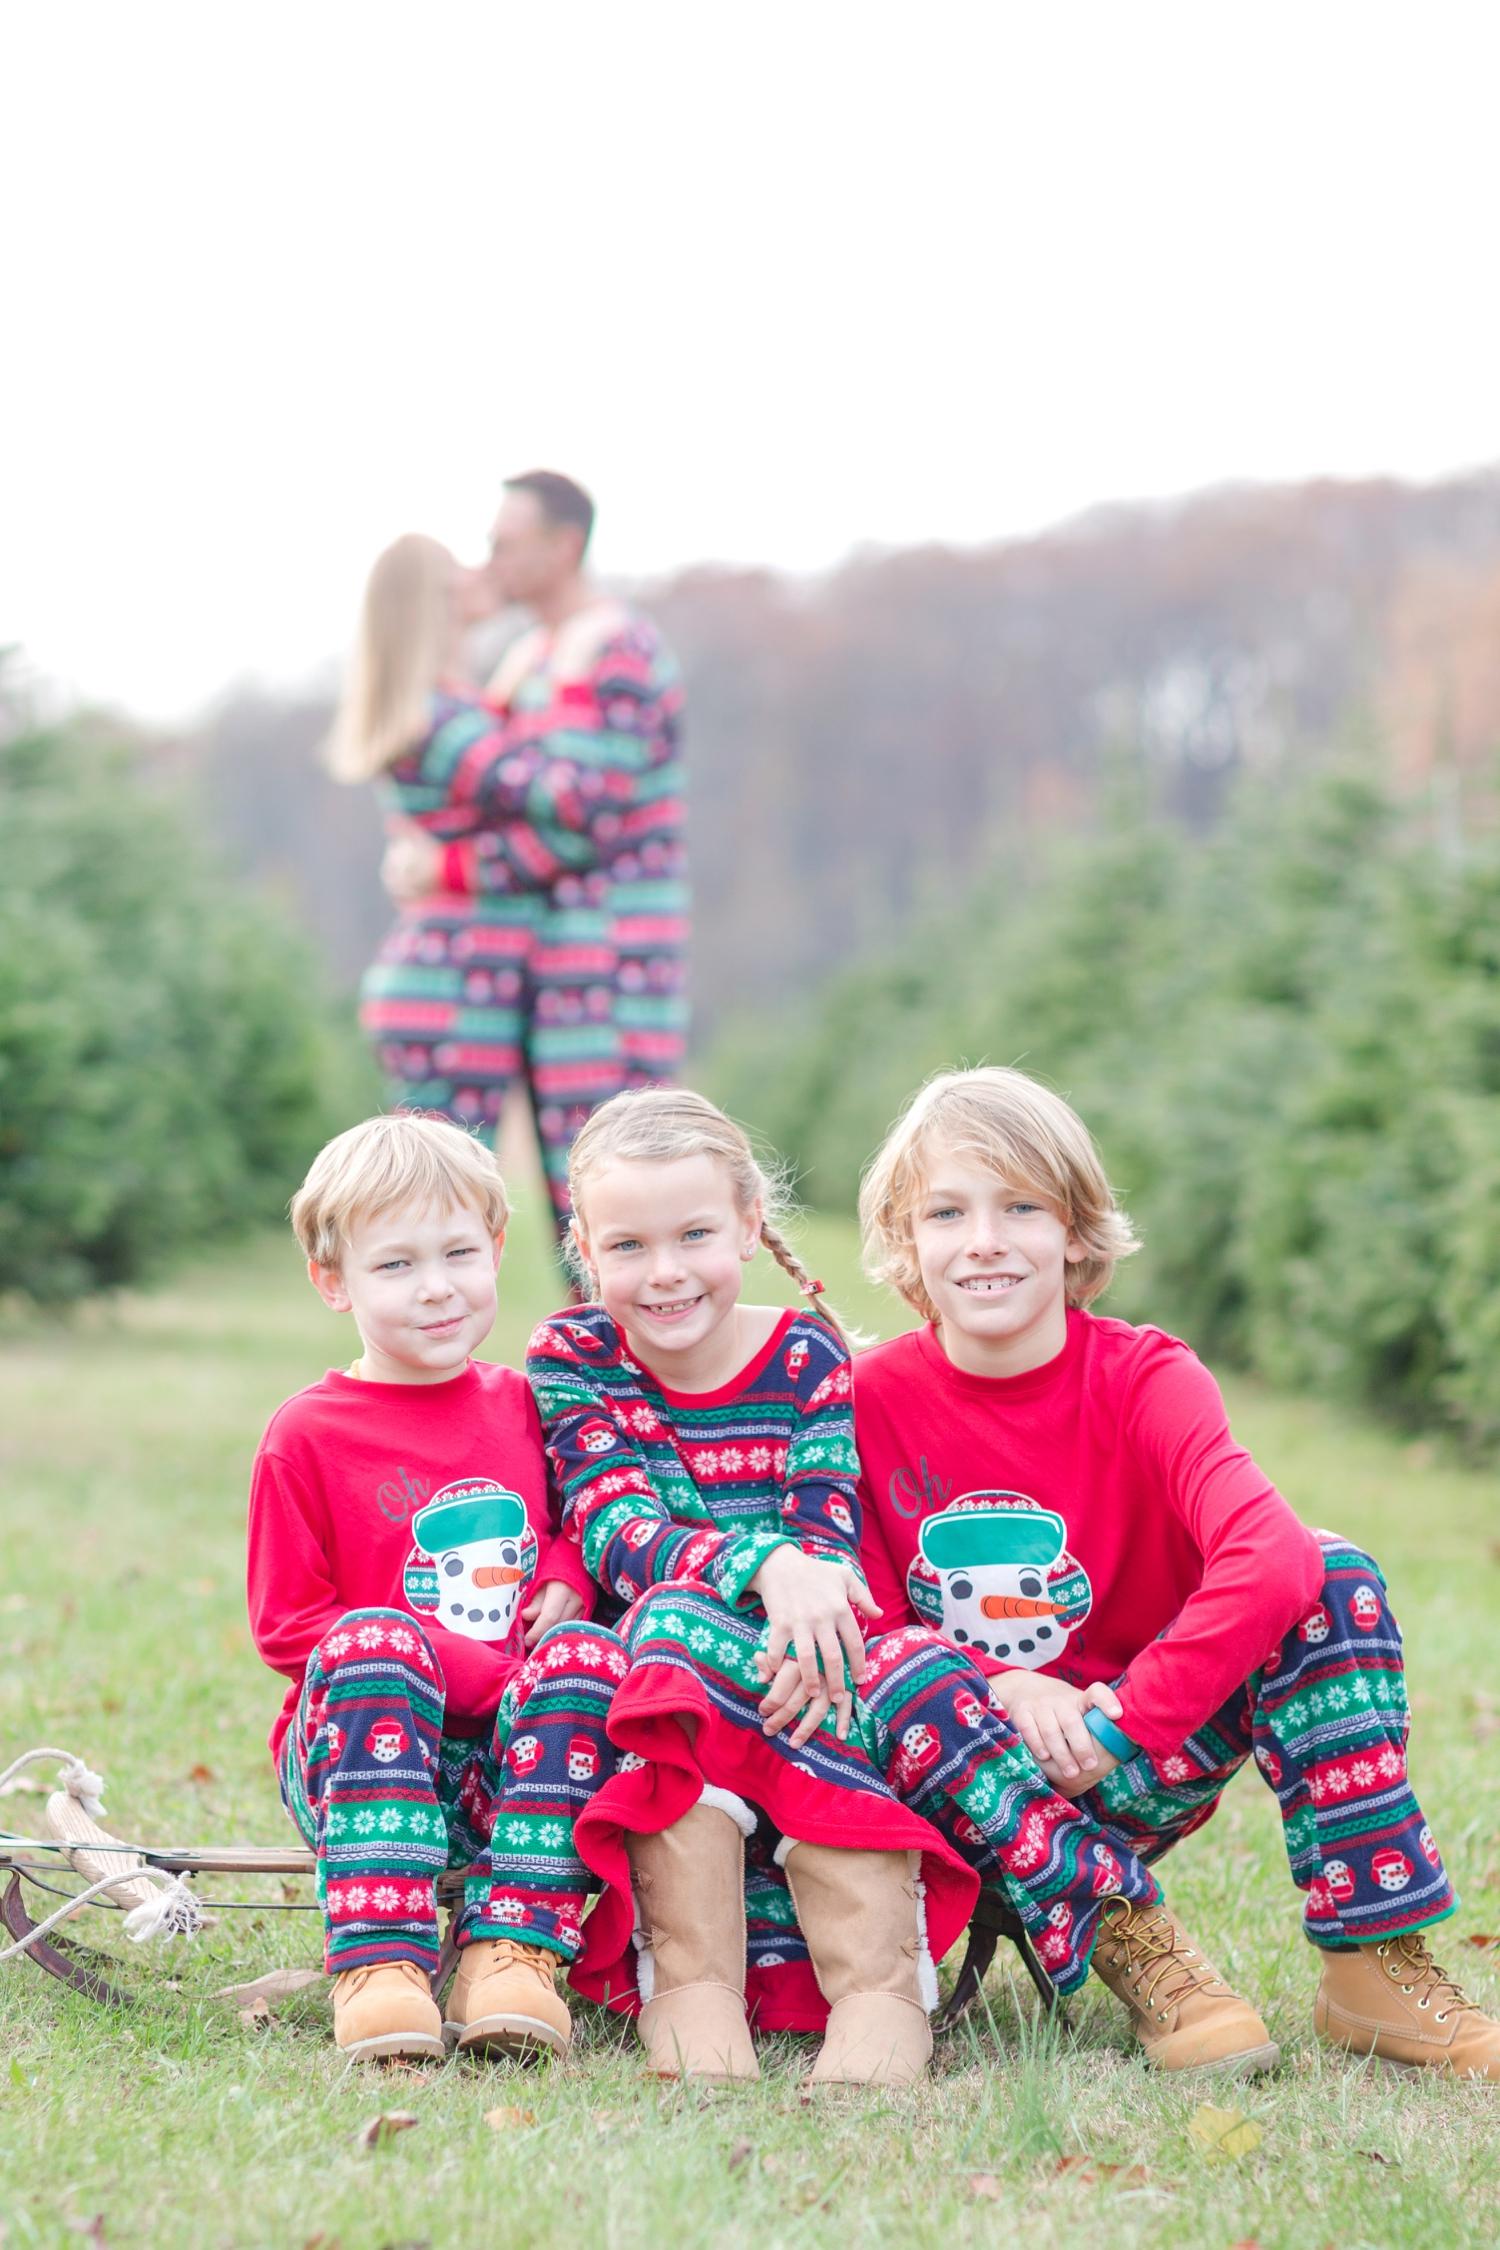 Golembiesky Family 2017-41_ruhl-tree-farm-baltimore-maryland-family-photography-anna-grace-photography-photo.jpg